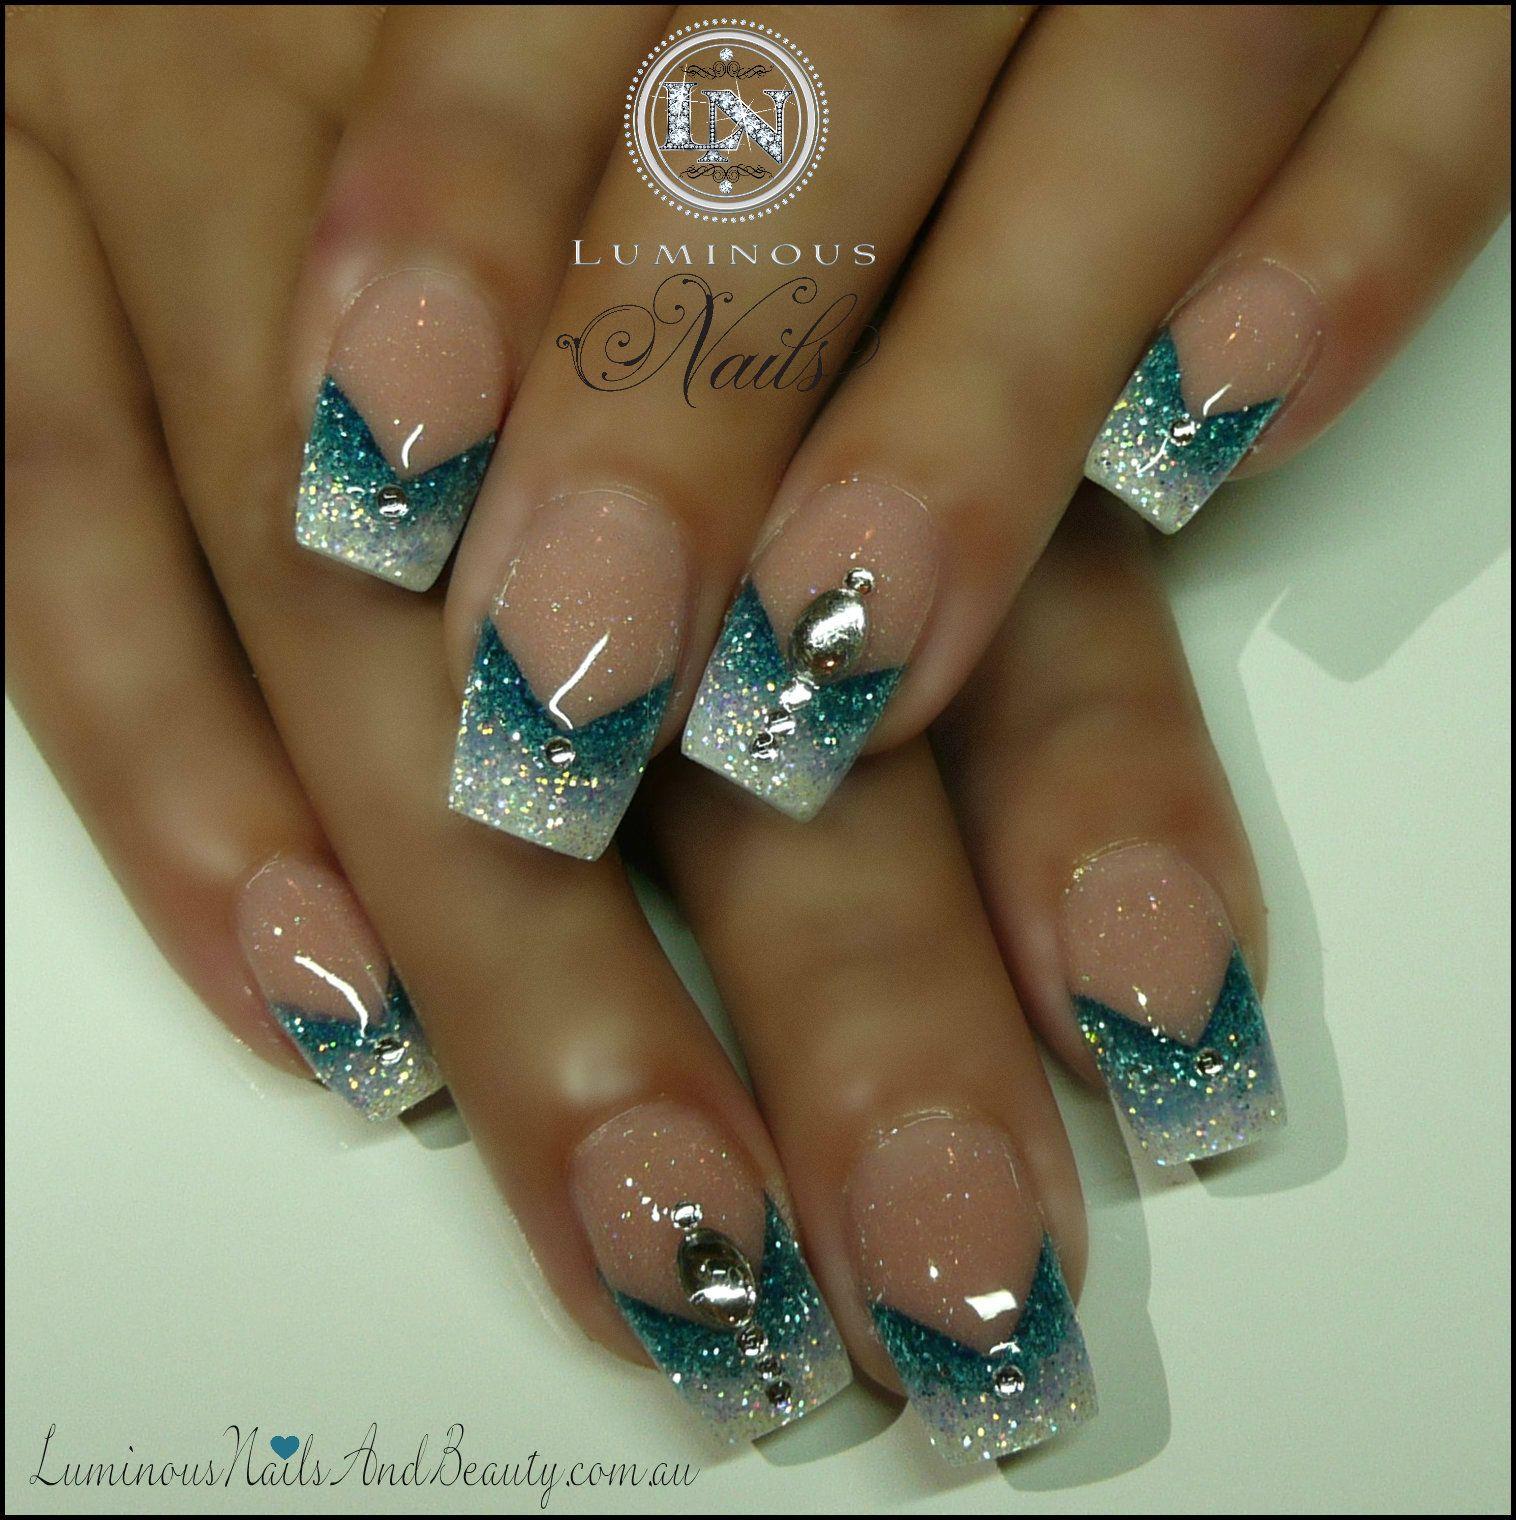 Luminous+Nails+&+Beauty,+Gold+Coast+Queensland+2.+Acrylic+Nails,+Gel ...